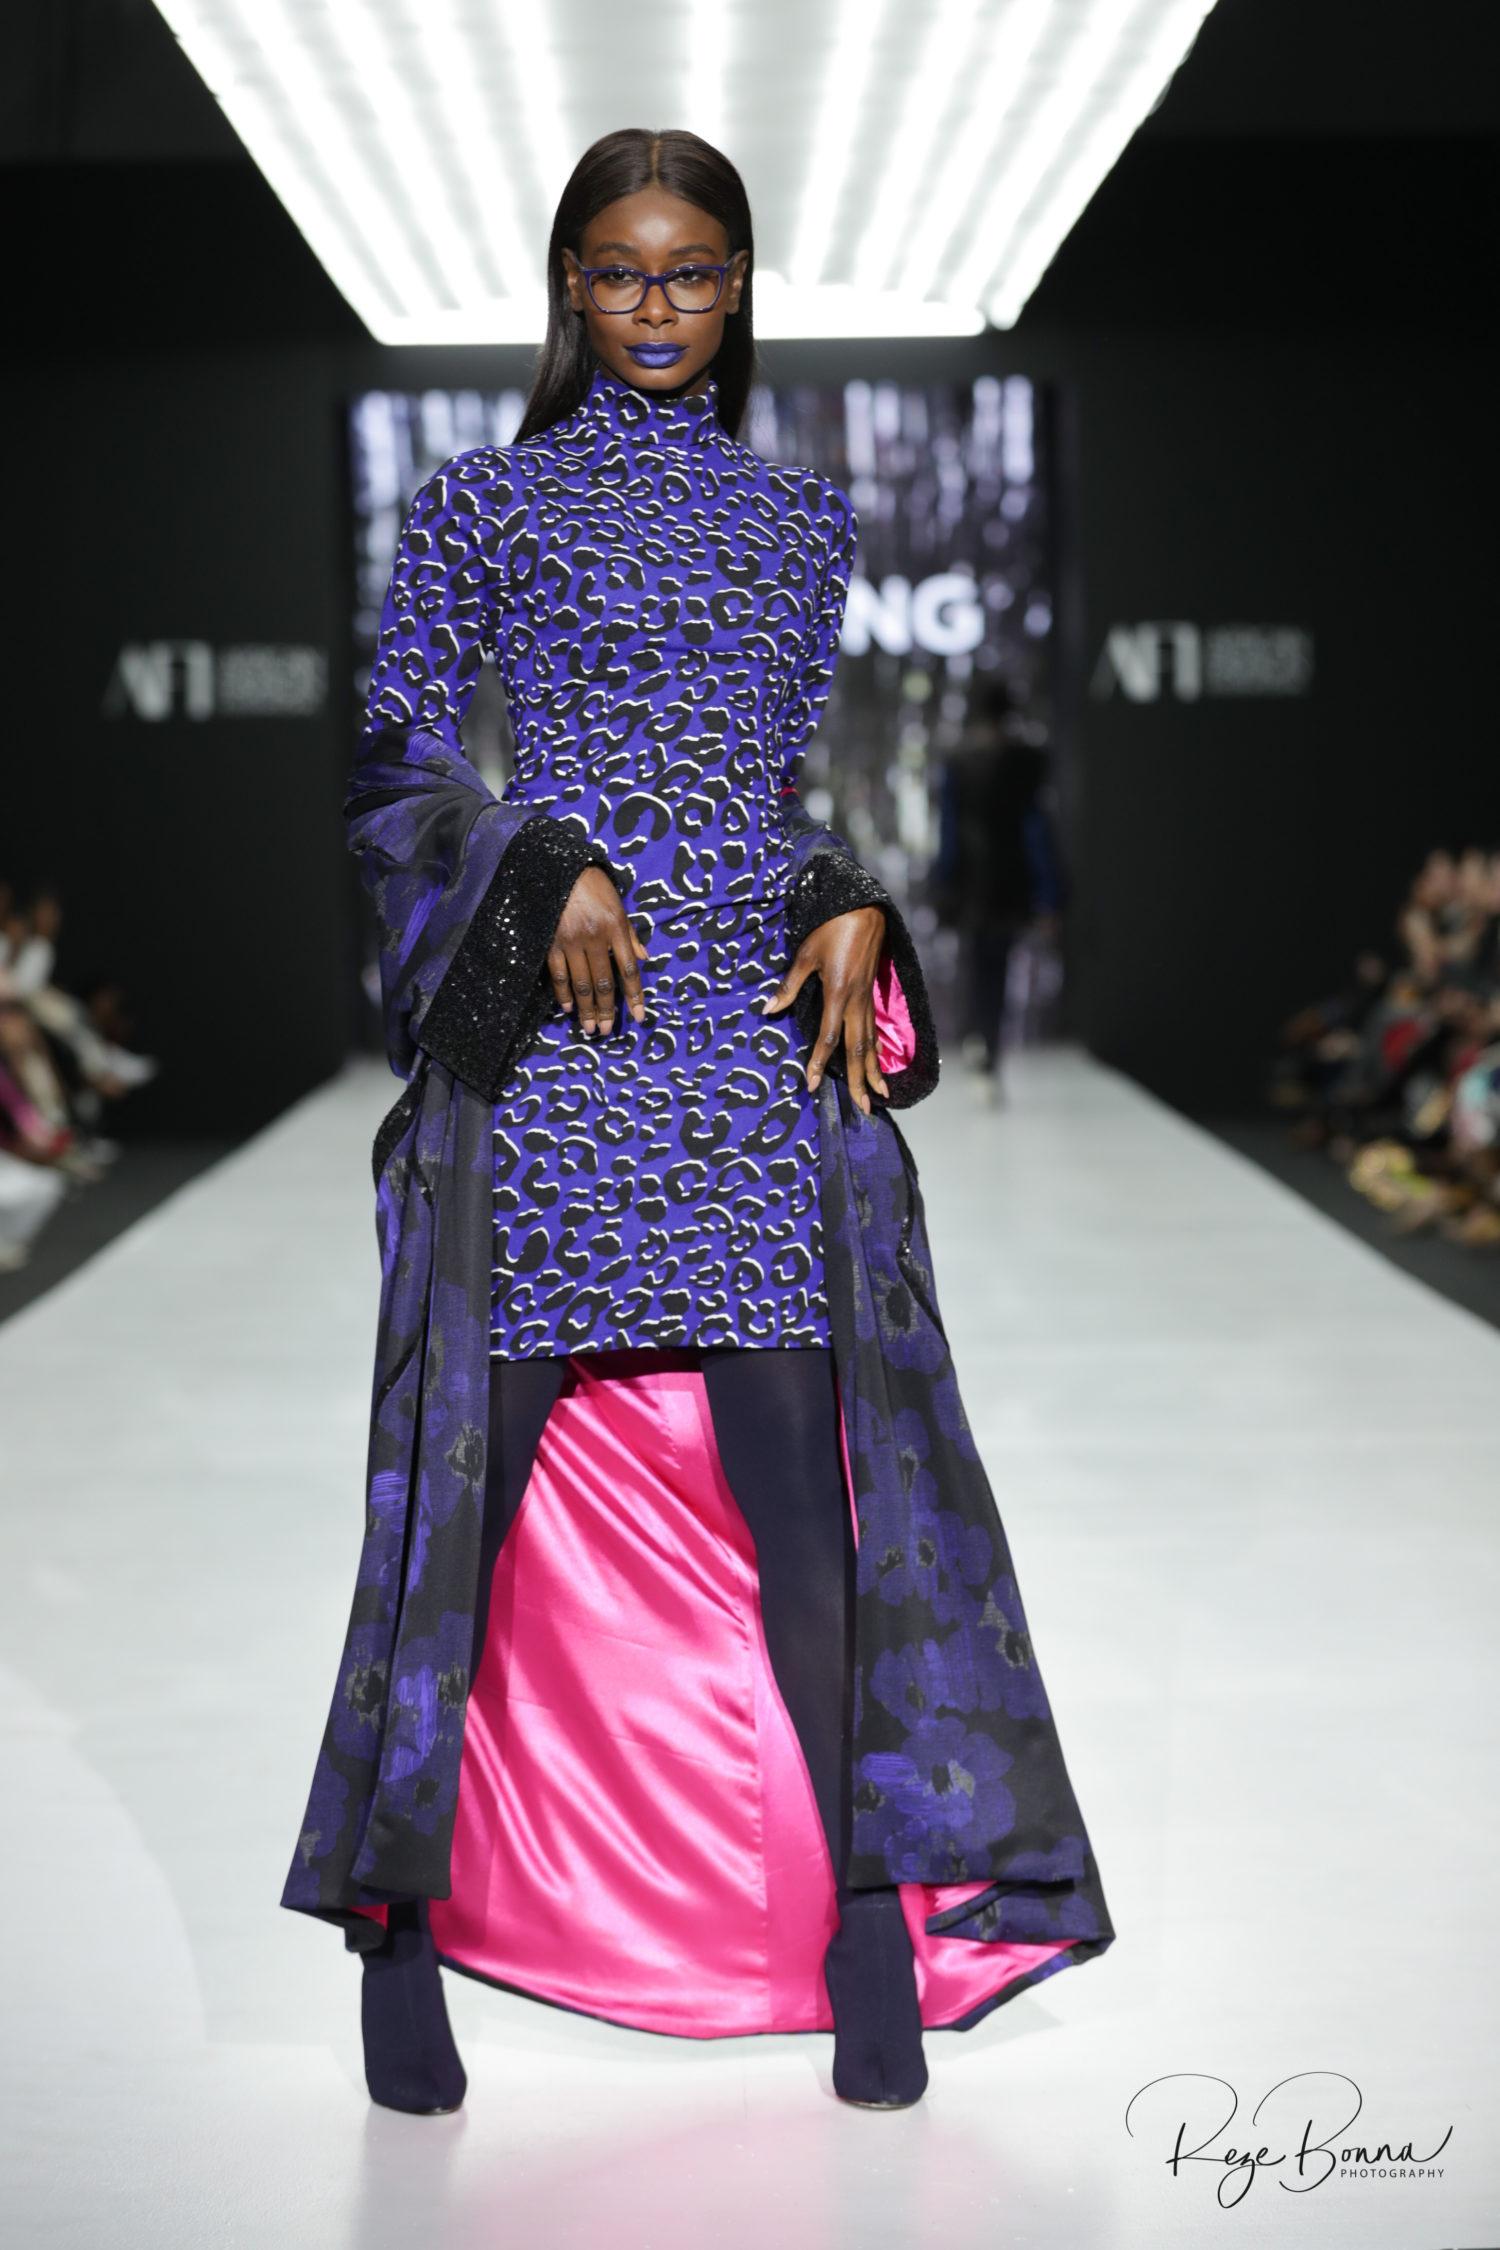 #AFICTFW19 | AFI Capetown Fashion Week Ruff Tung